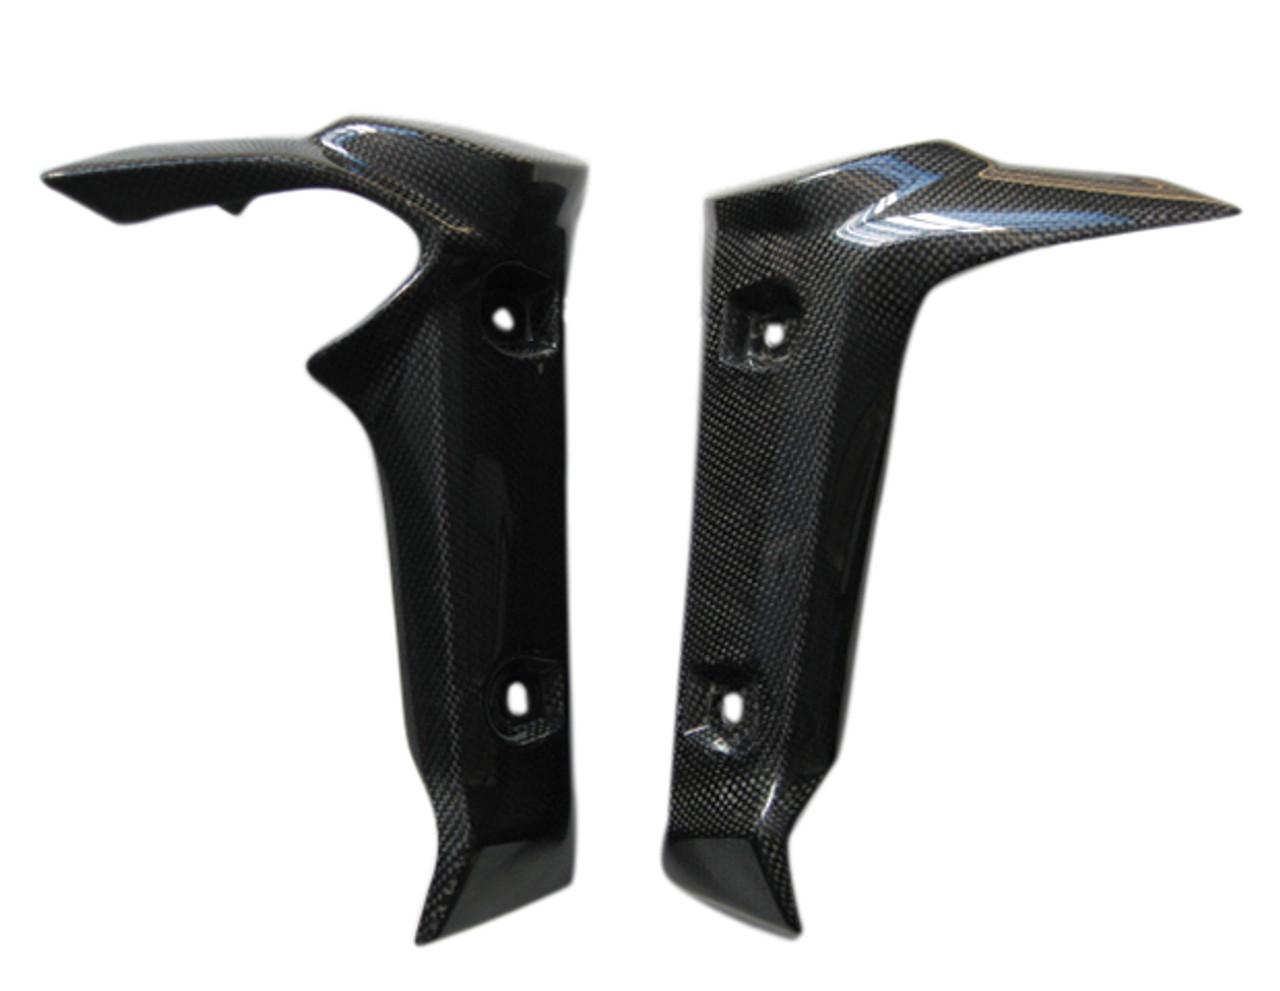 Glossy Plain Weave Carbon Fiber Radiator Cover with Racingmesh for Yamaha FZ1 06 - 12 (naked bike)